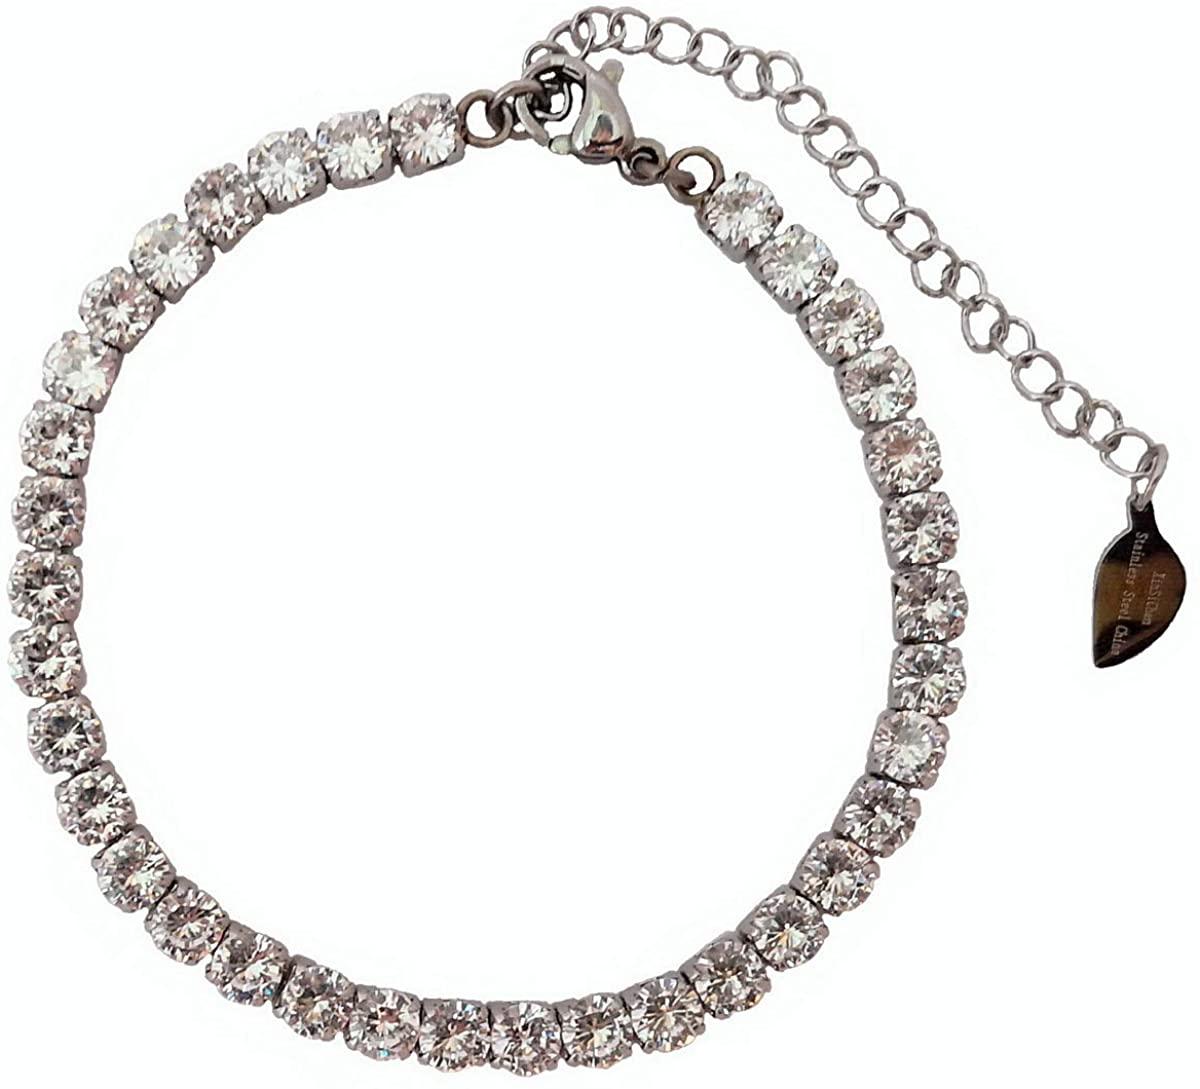 XinSiChen 4mm Cubic Zirconia Classic Tennis Bracelet 6.75